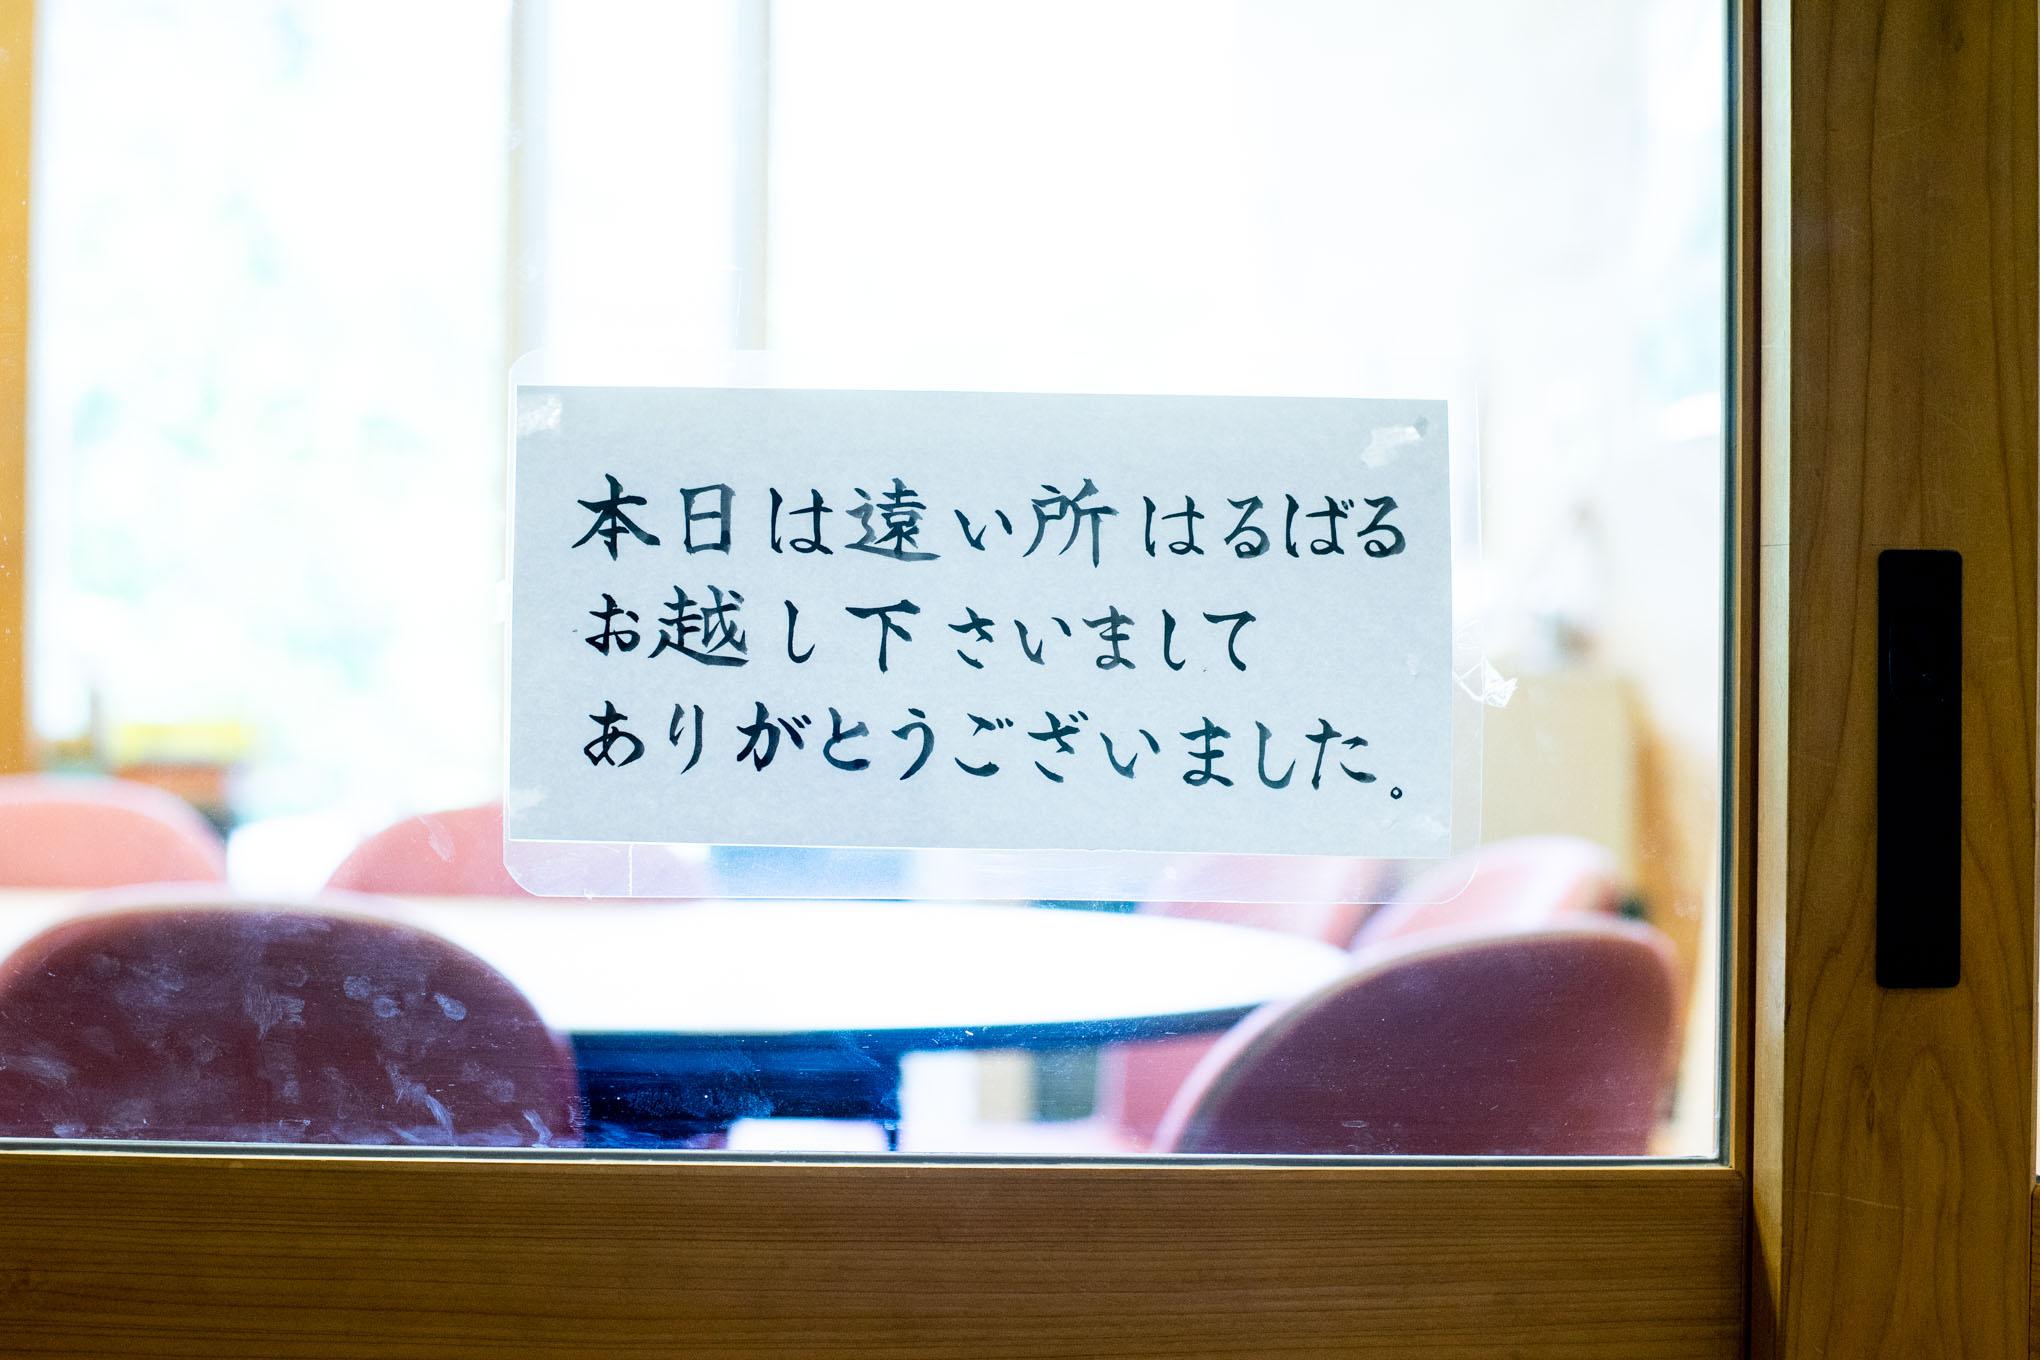 umajimura-2015-20